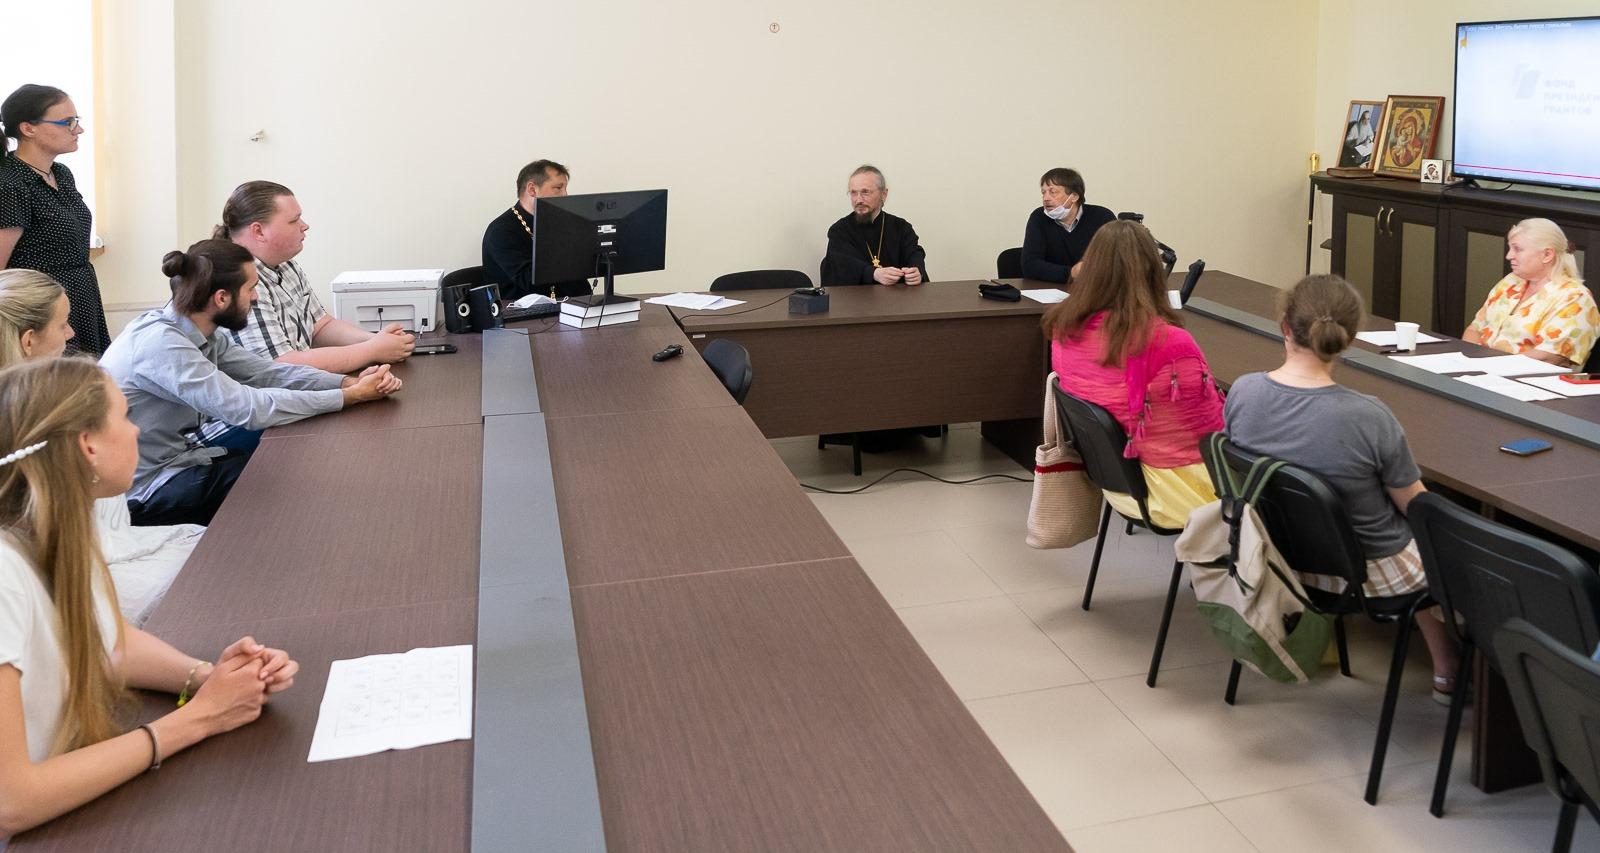 Митрополит Минский и Заславский Вениамин на встрече с волонтерами по коммуникации с глухими и слабослышащими людьми на приходах